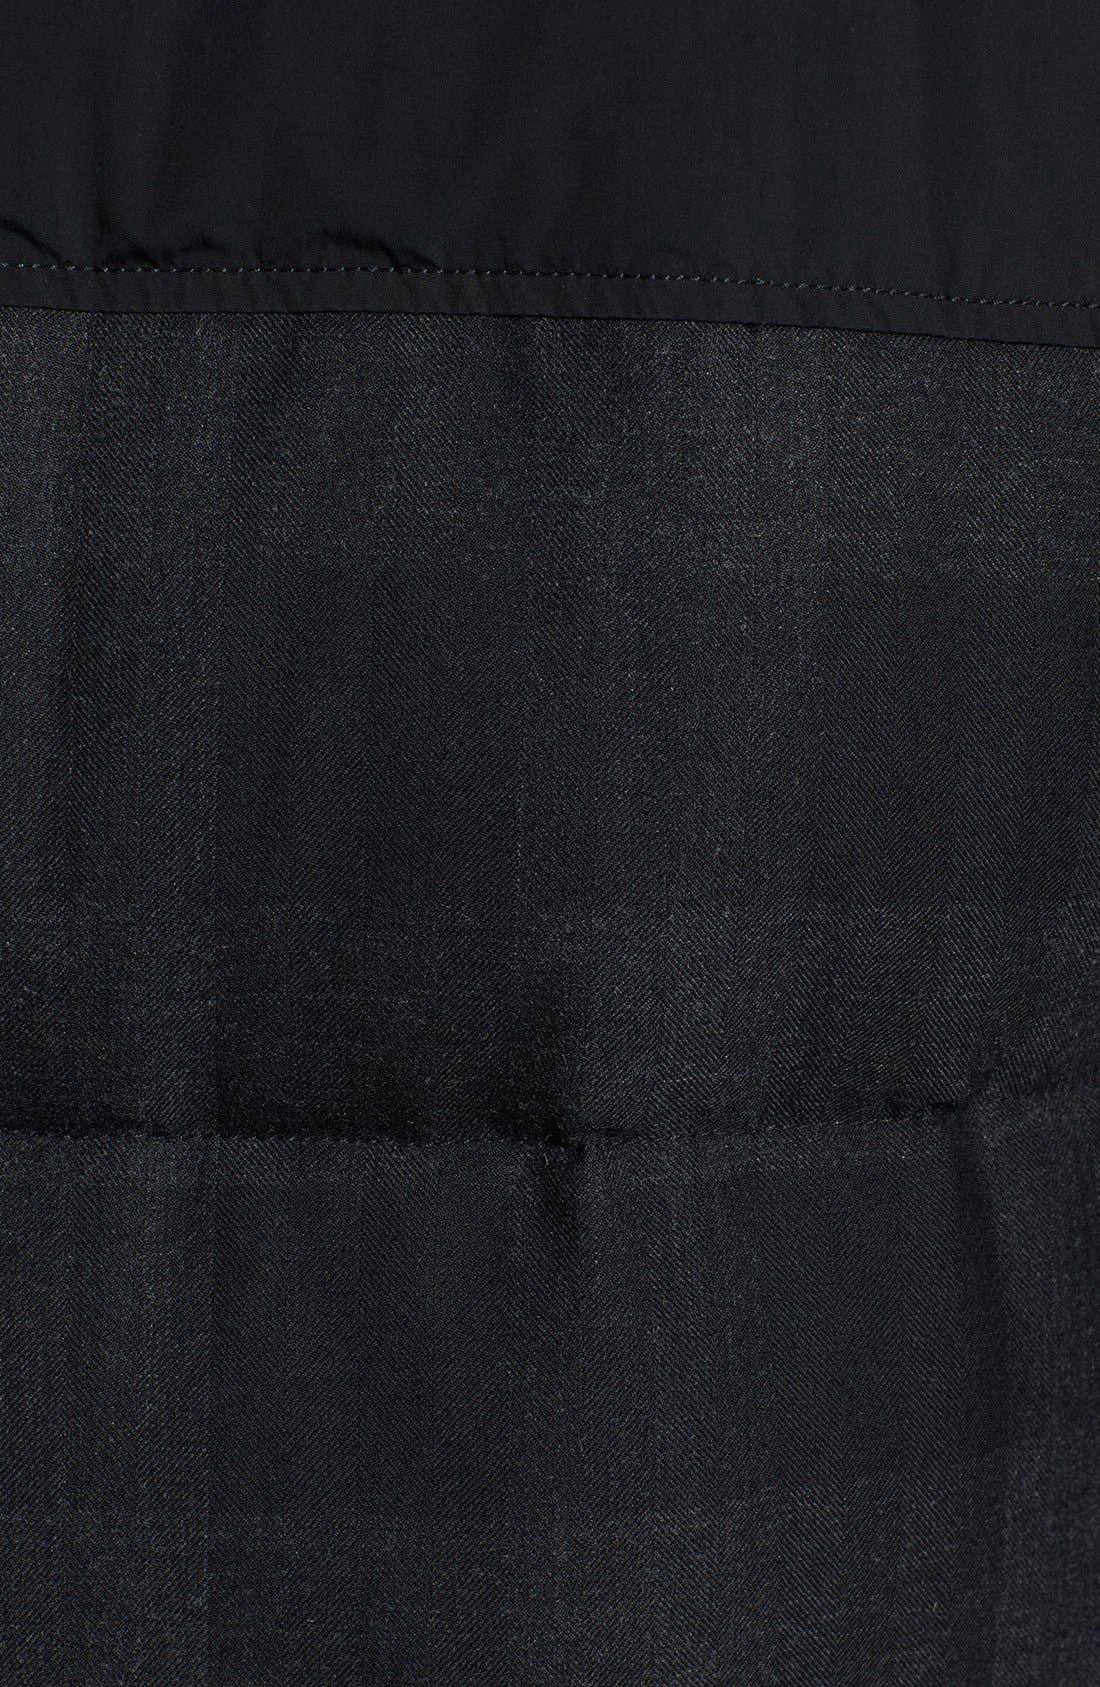 Woolrich 'Pocono' Check Print Shearling Lined Down Parka,                             Alternate thumbnail 3, color,                             003